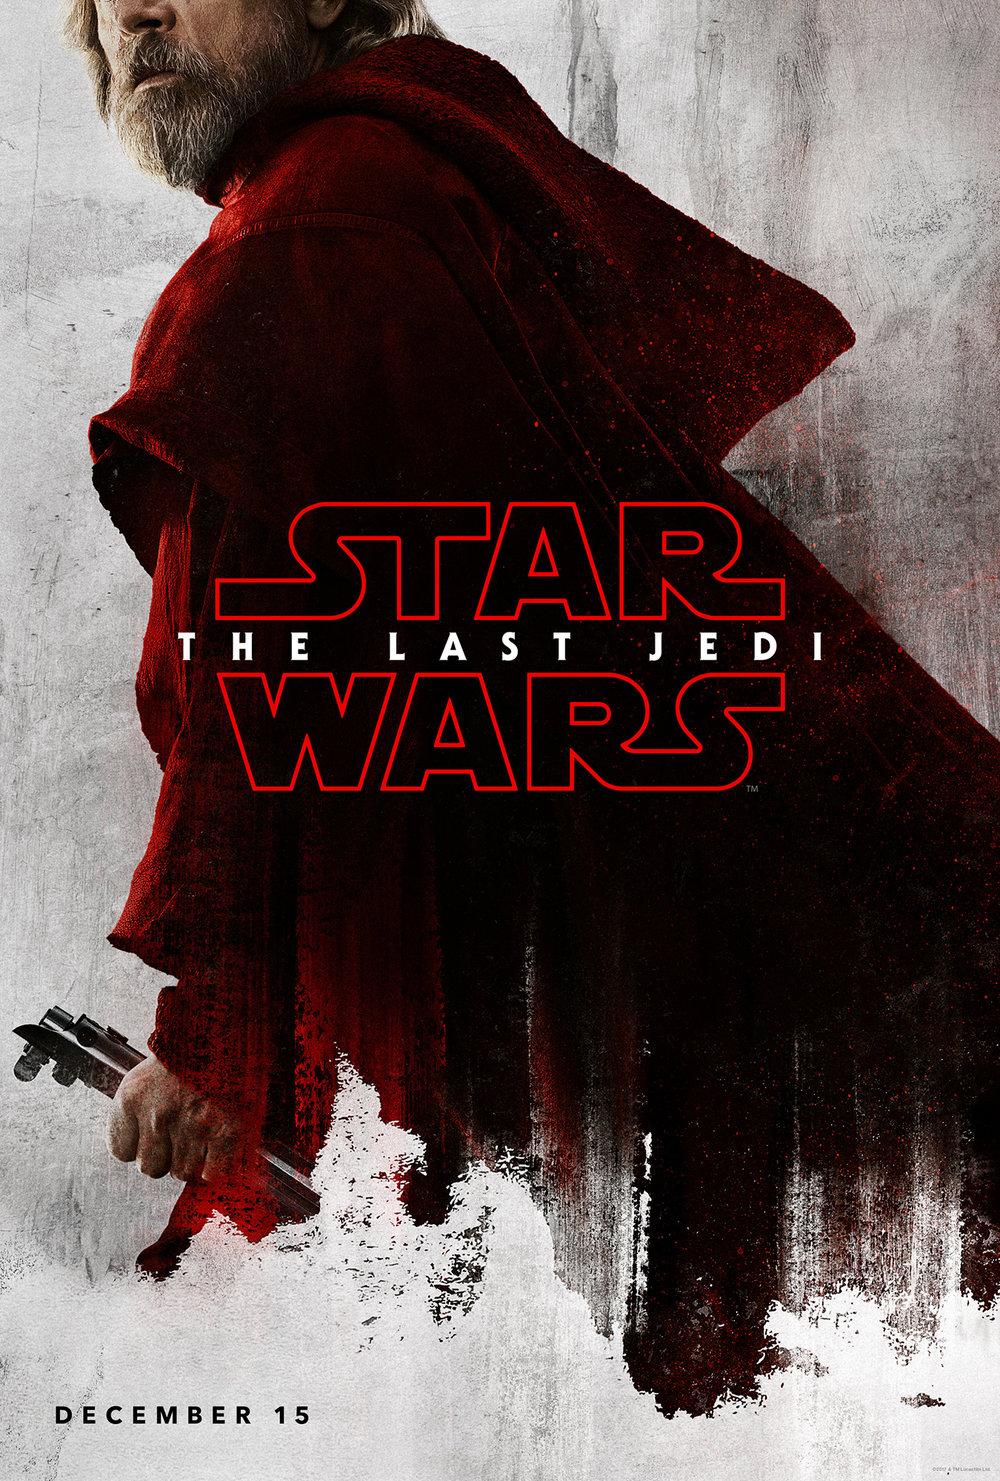 StarWars_VIII_Online_Character_Luke_100dpi.jpg